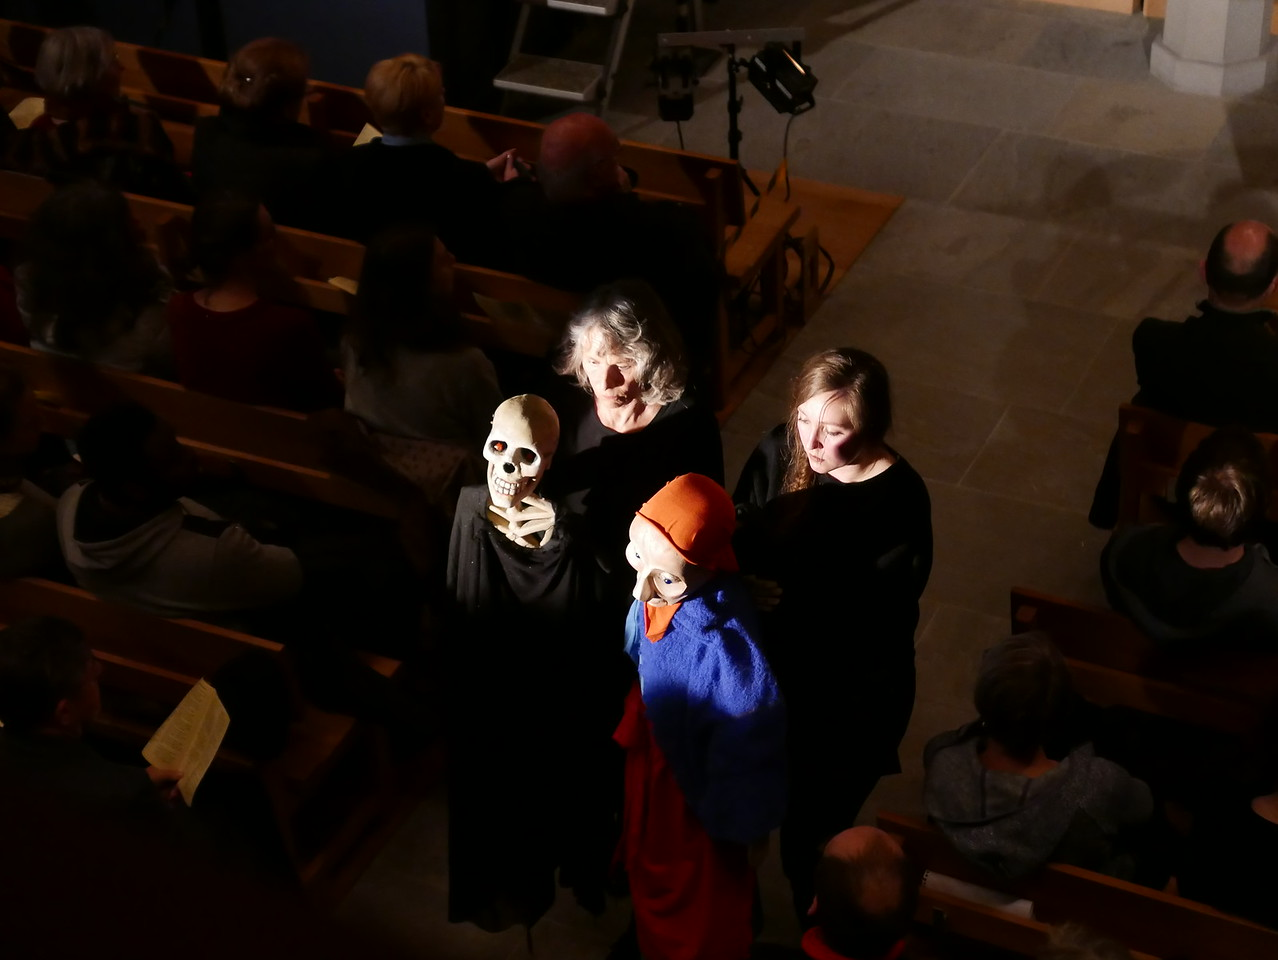 @ 28.03.18, 20:58 / kath. Kirche Veltheim-Winterthur